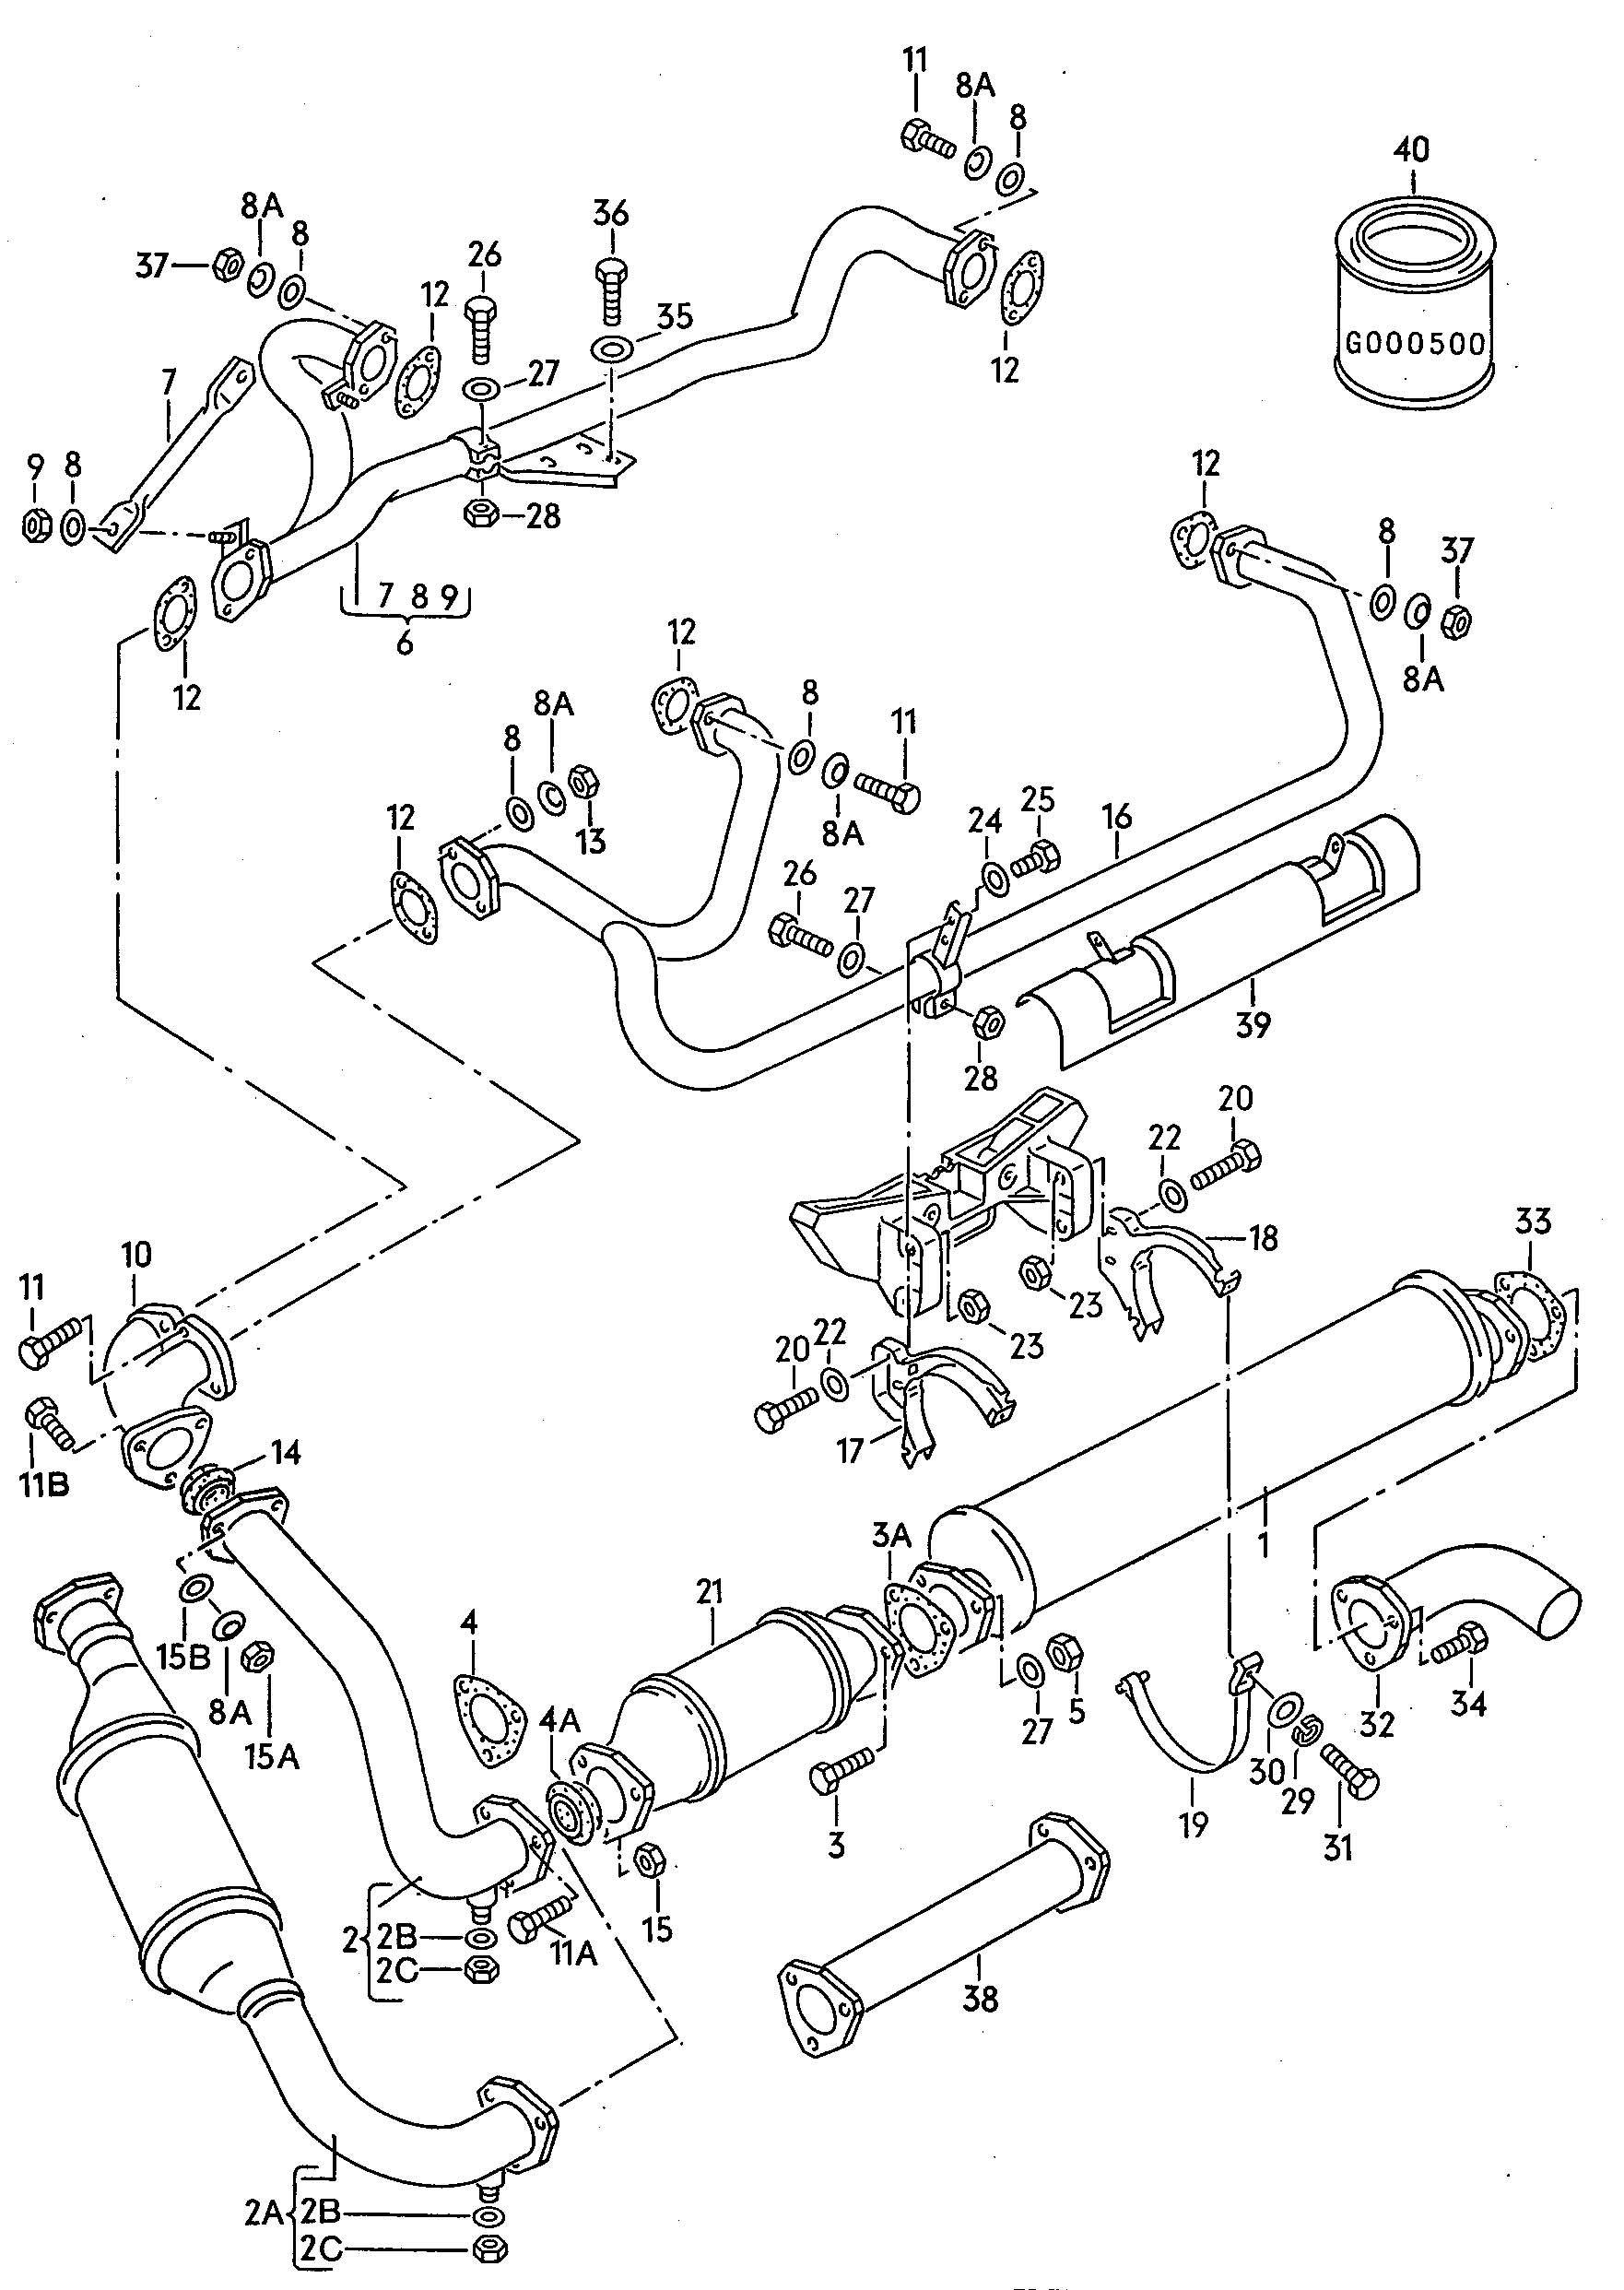 Exhaust System 2 1ltr Volkswagen Vw Vanagon Syncro